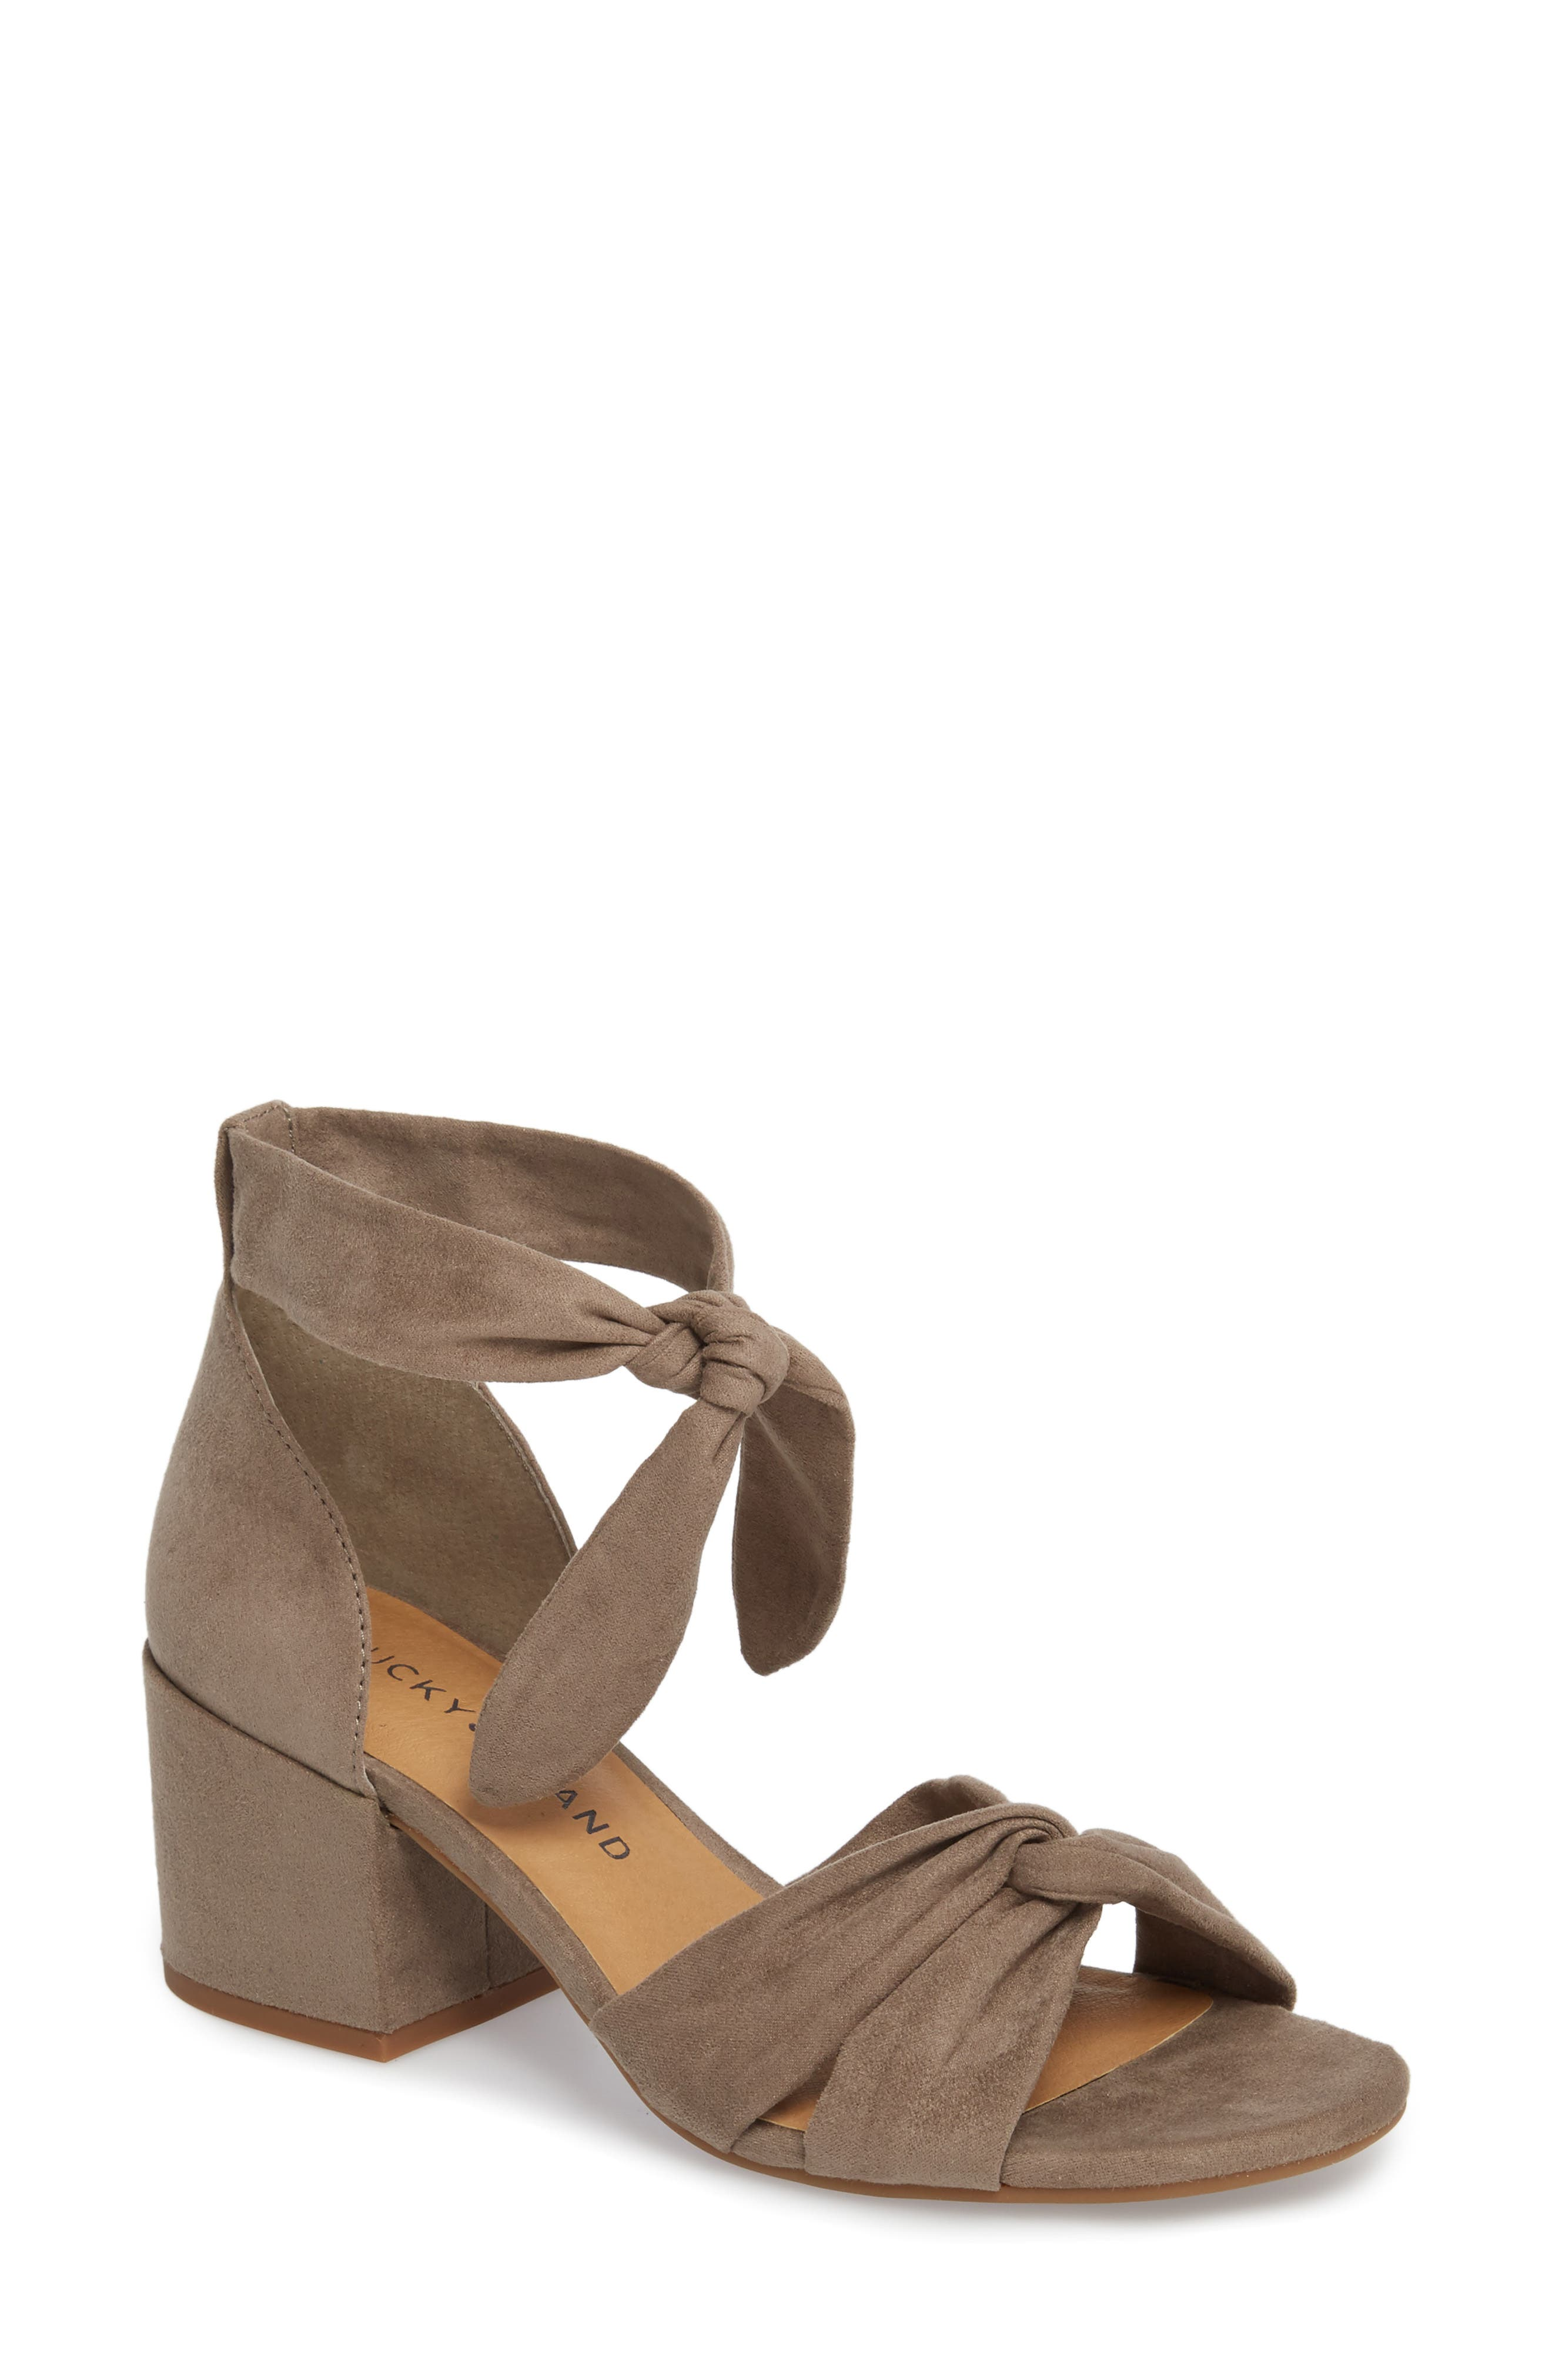 Xaylah Ankle Strap Sandal,                             Main thumbnail 4, color,